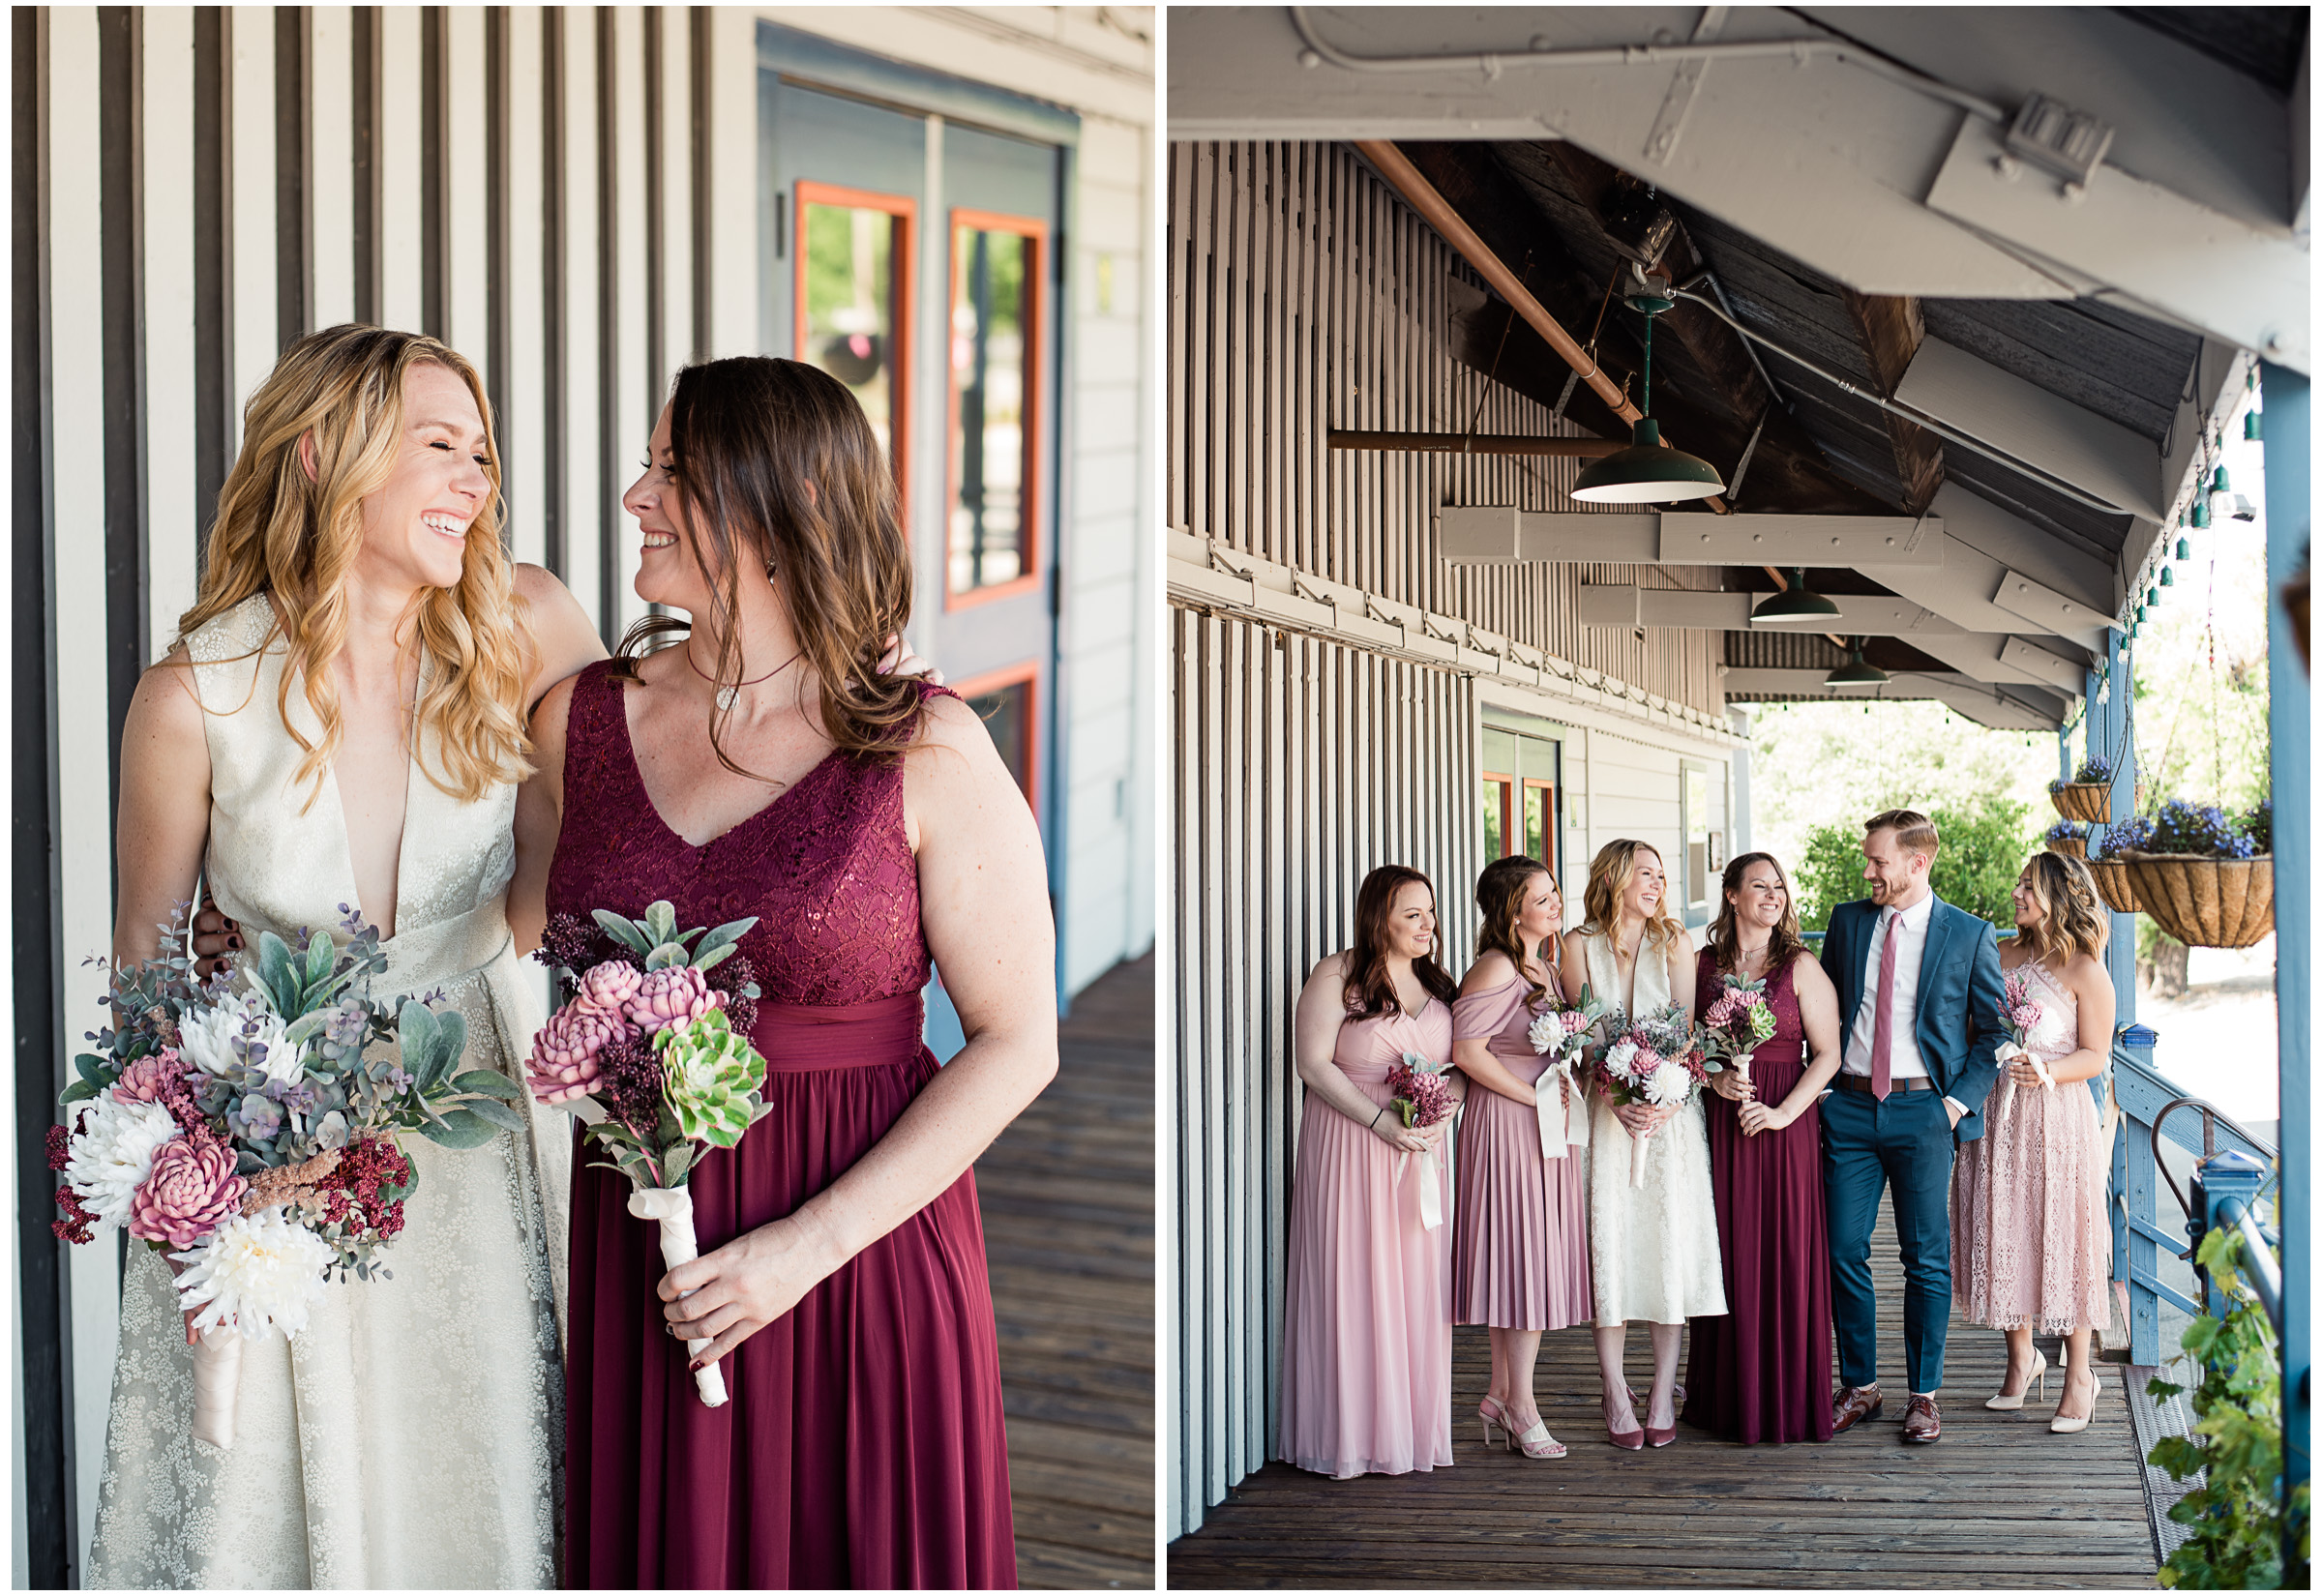 Loomis Wedding - Sacramento Photographer - Blue Goose - Justin Wilcox Photography - 7.jpg